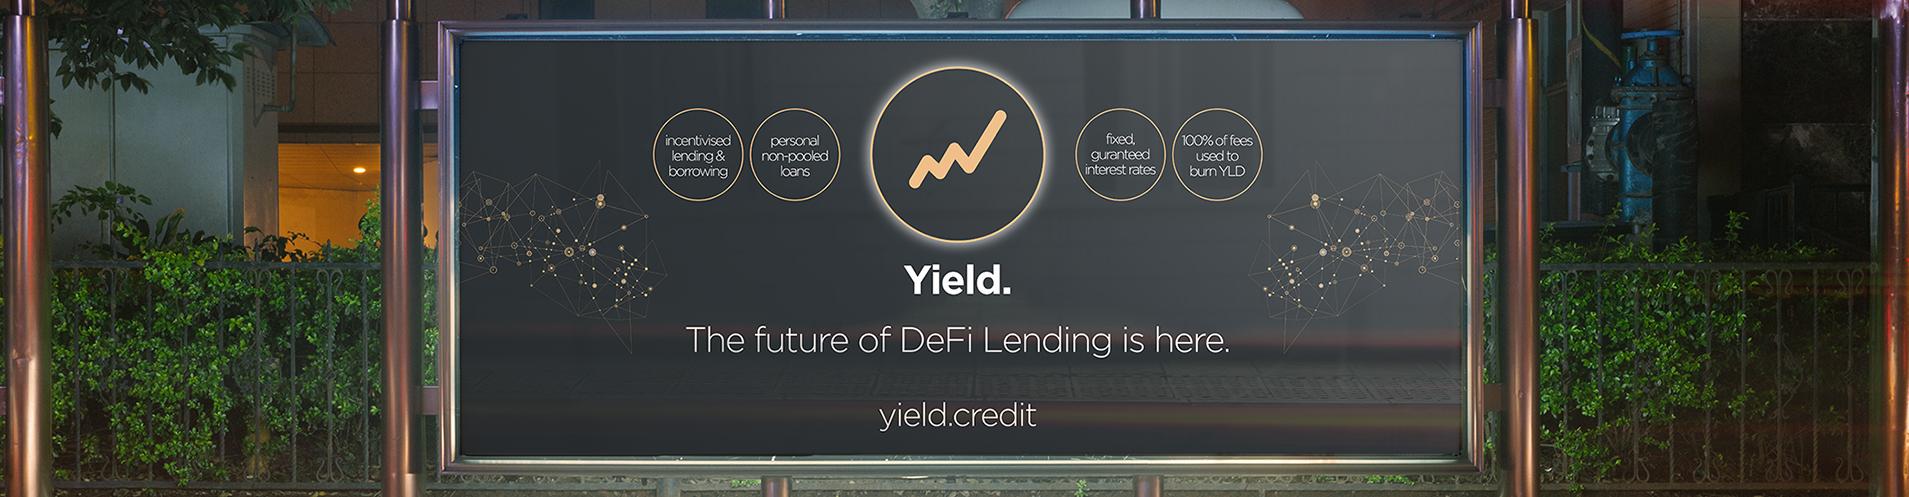 Yield.credit